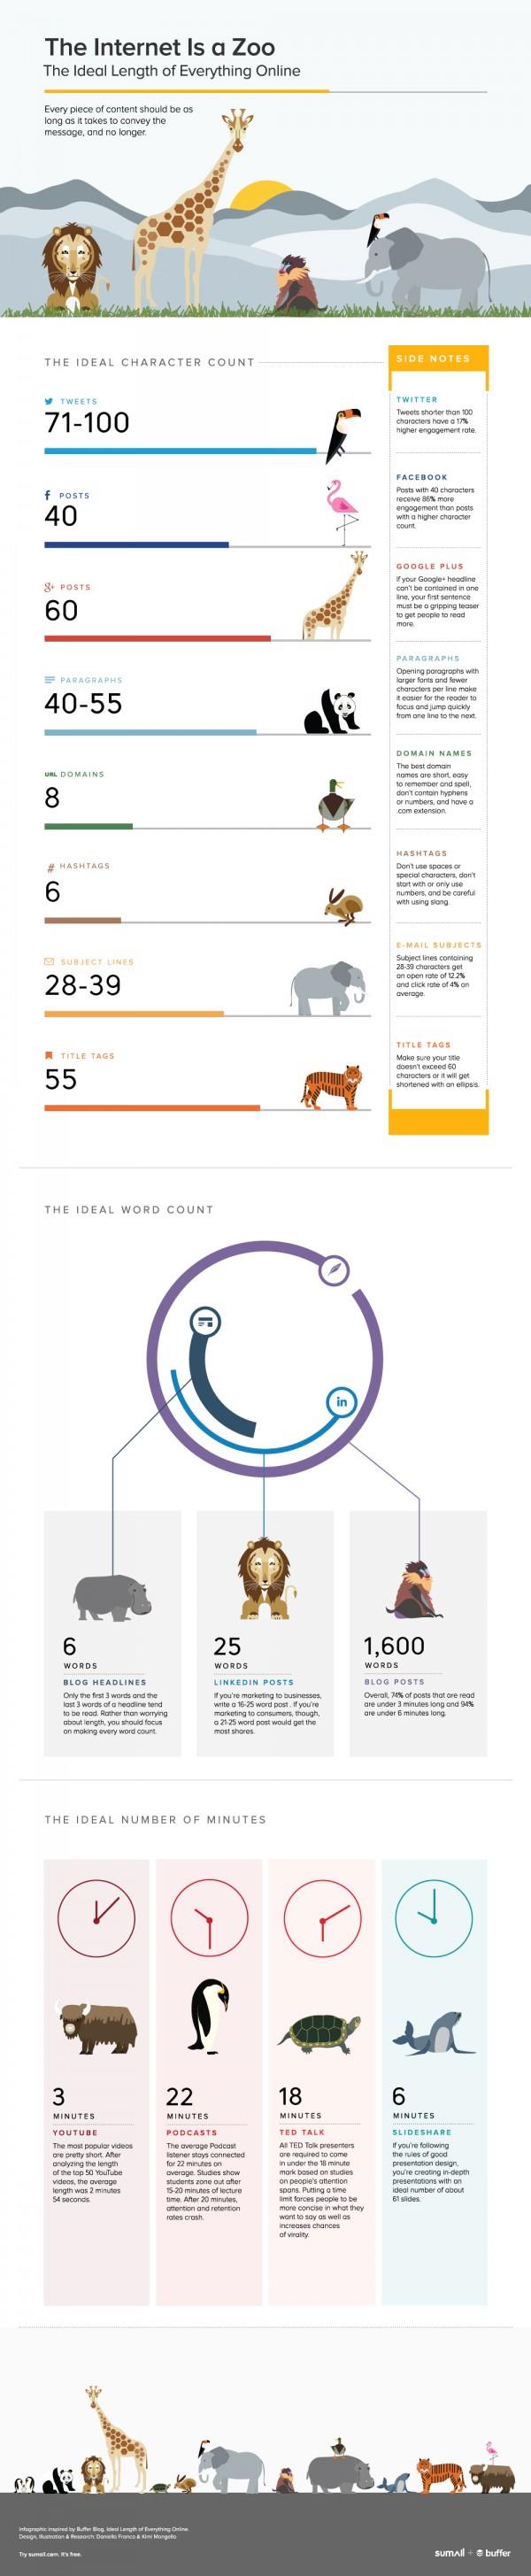 social-media-length-infographic-600x2910